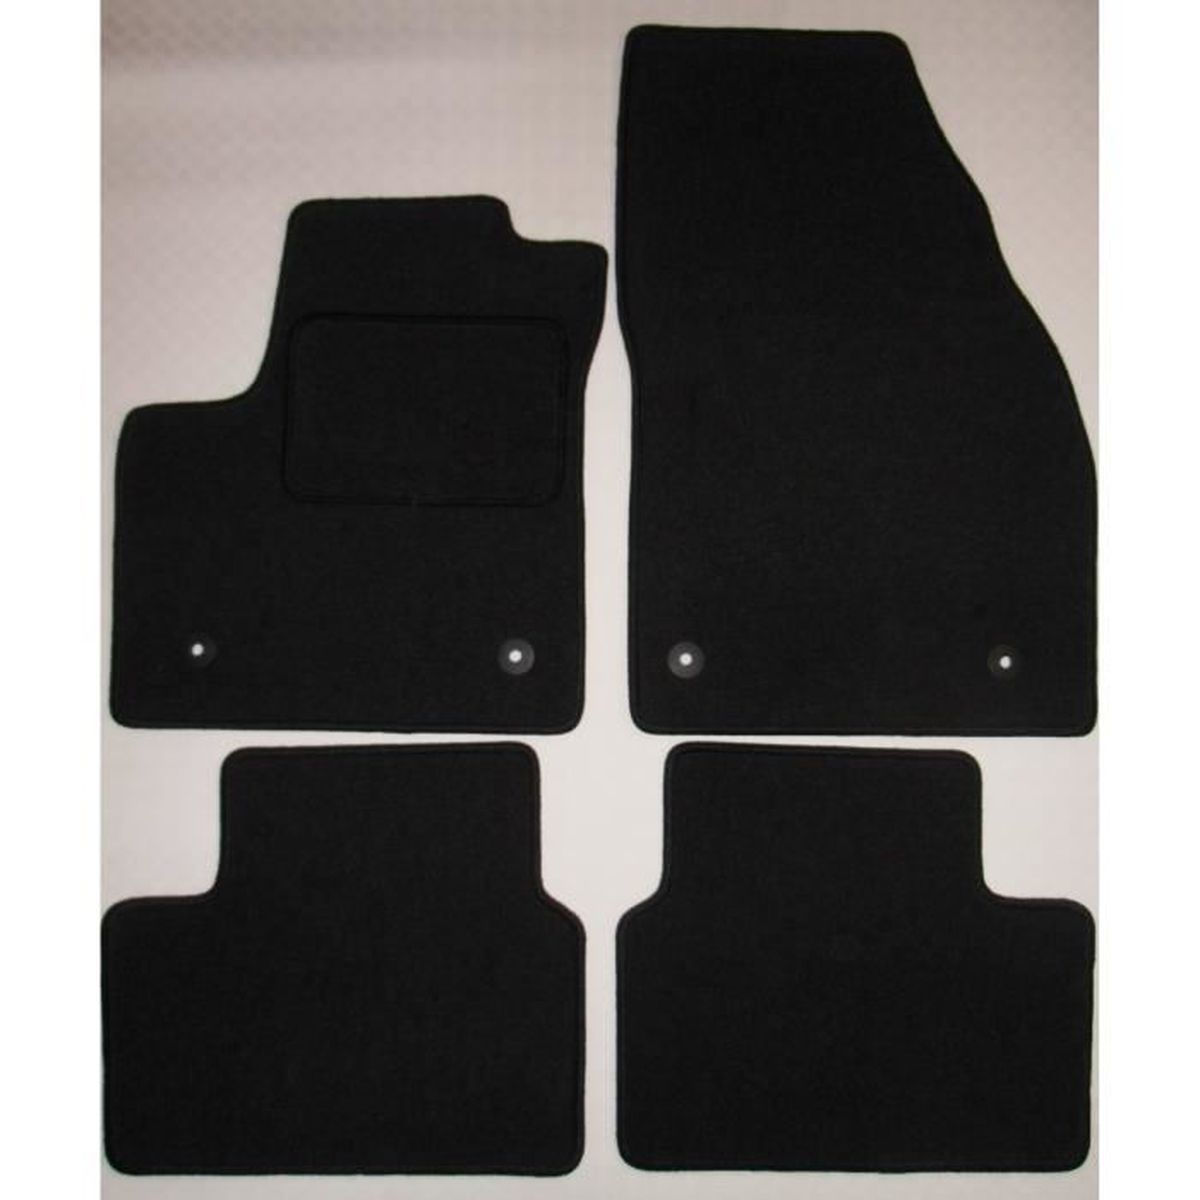 noir Tapis de sol en Caoutchouc Opel Meriva A 2003-2010 4 unités